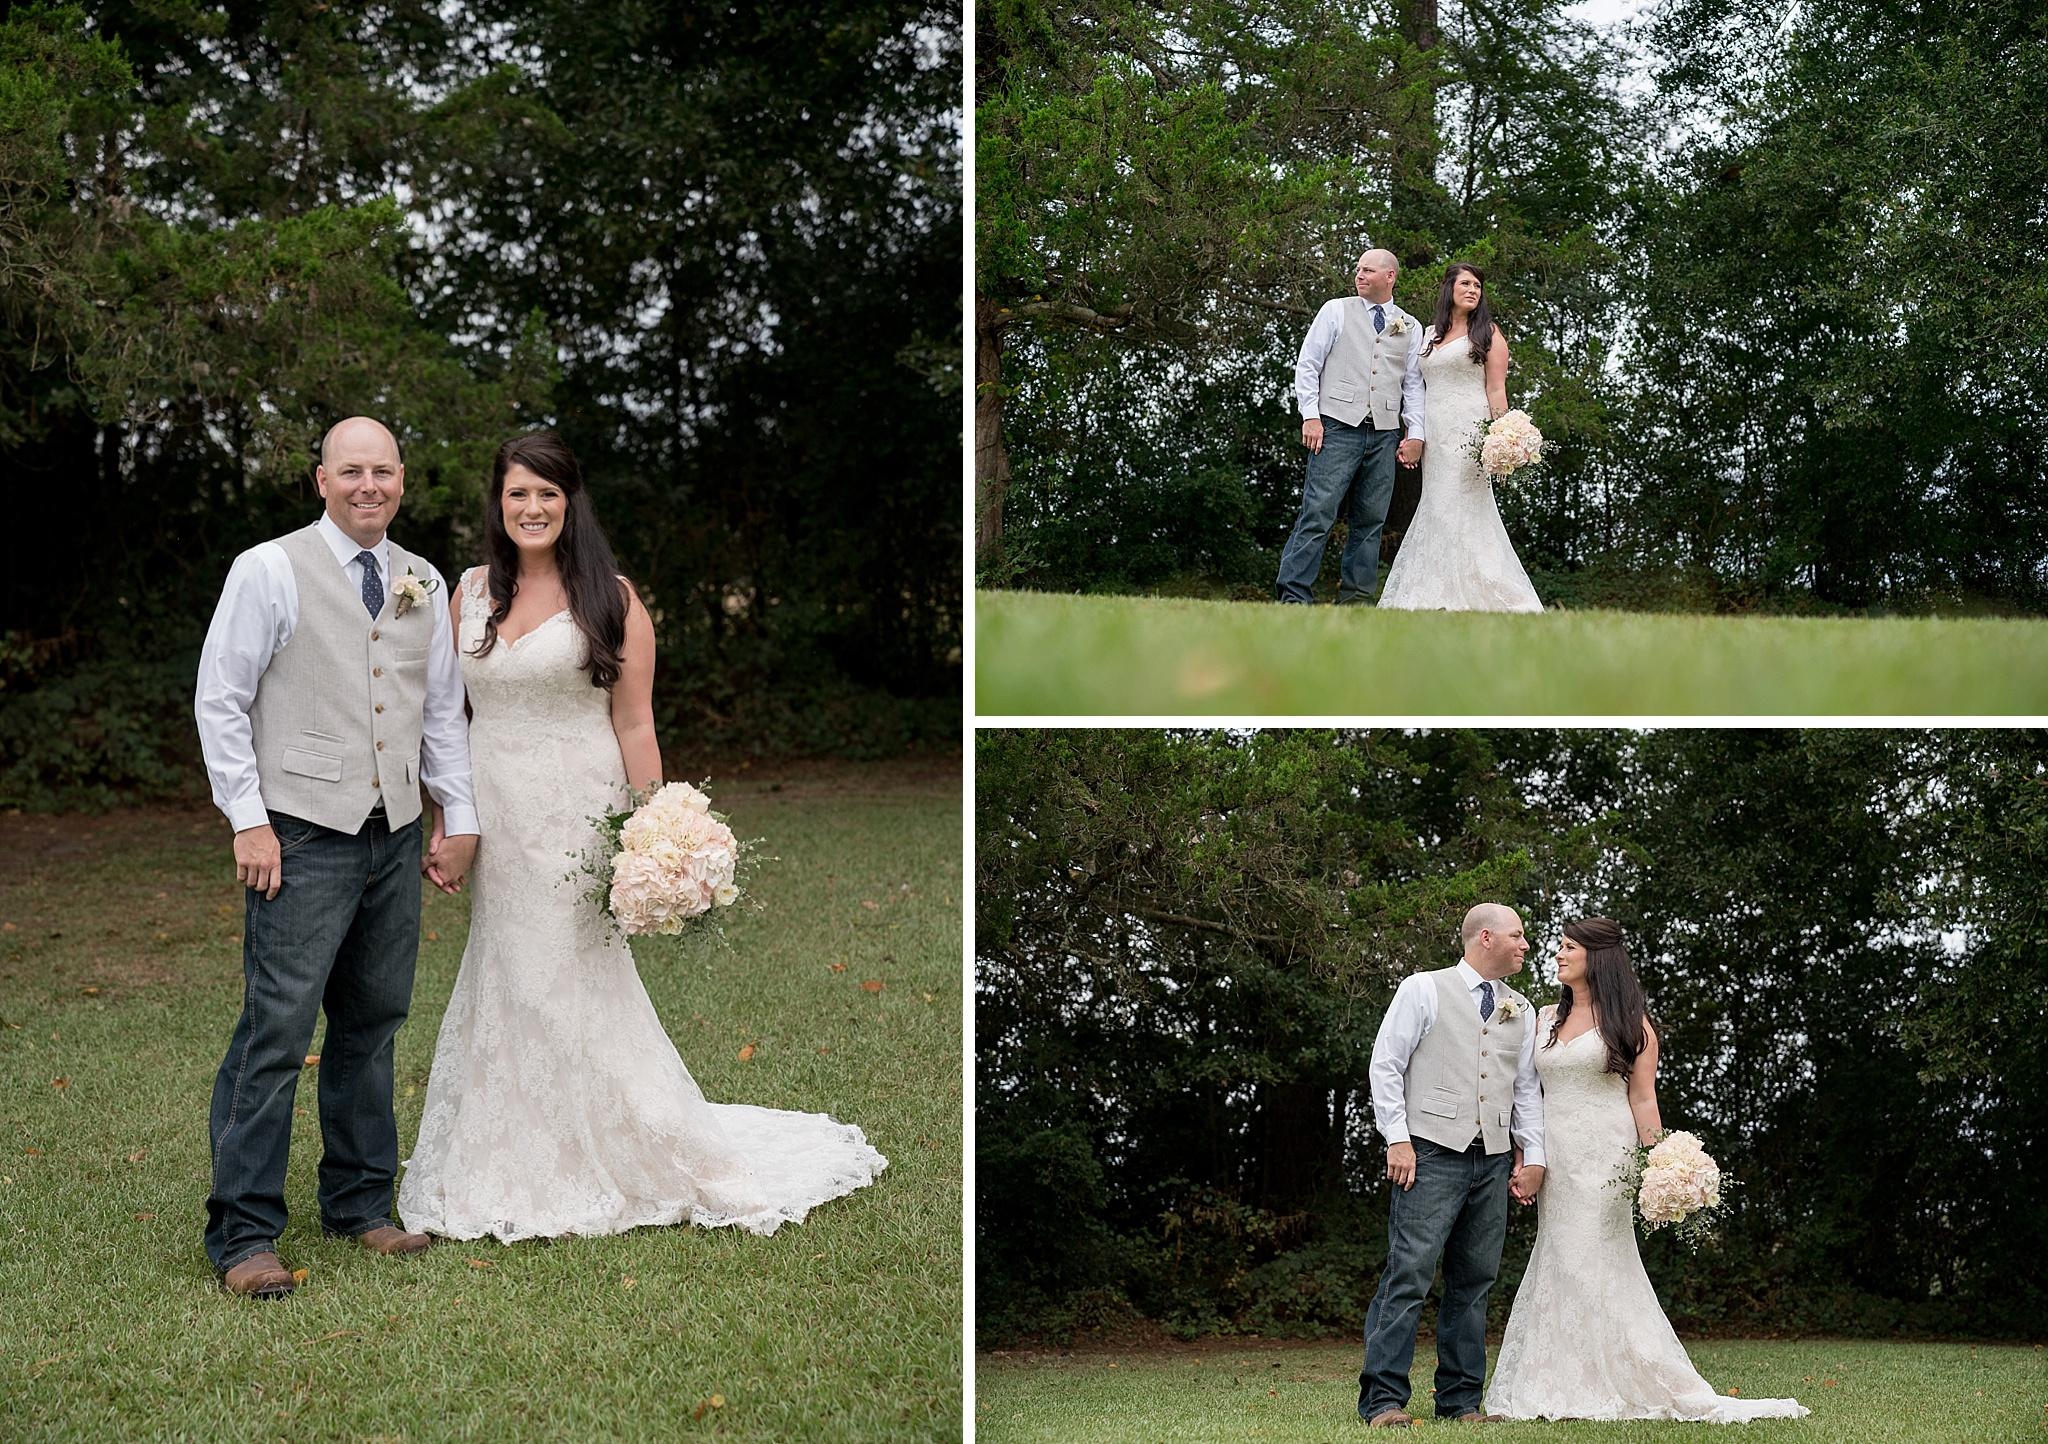 Tarboro-NC-Wedding-Photographer-035.jpg